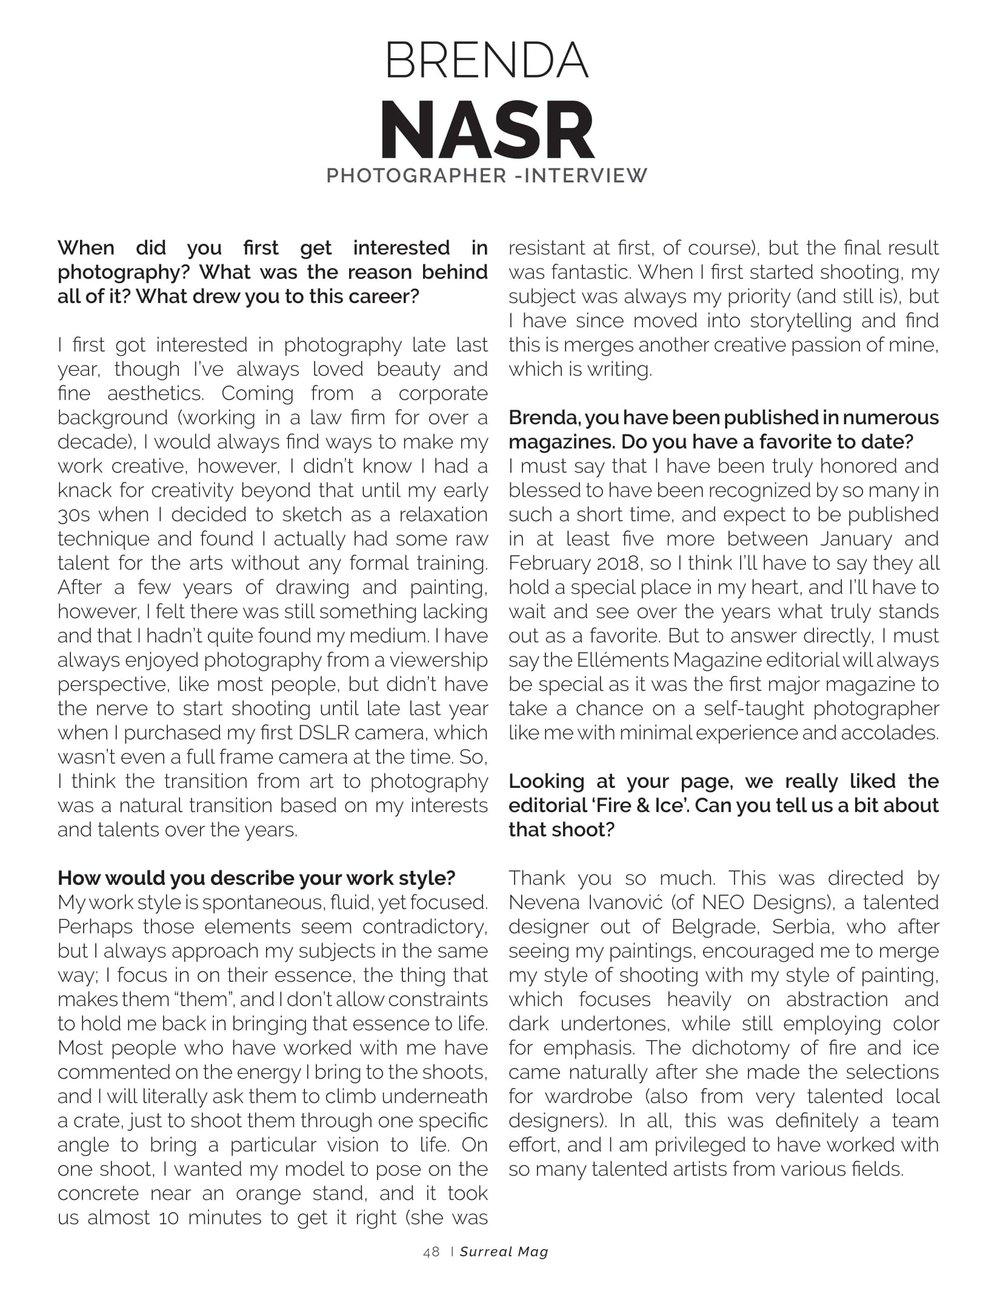 Surreal_Beauty_Magazine_Voracious (1)-48.jpg